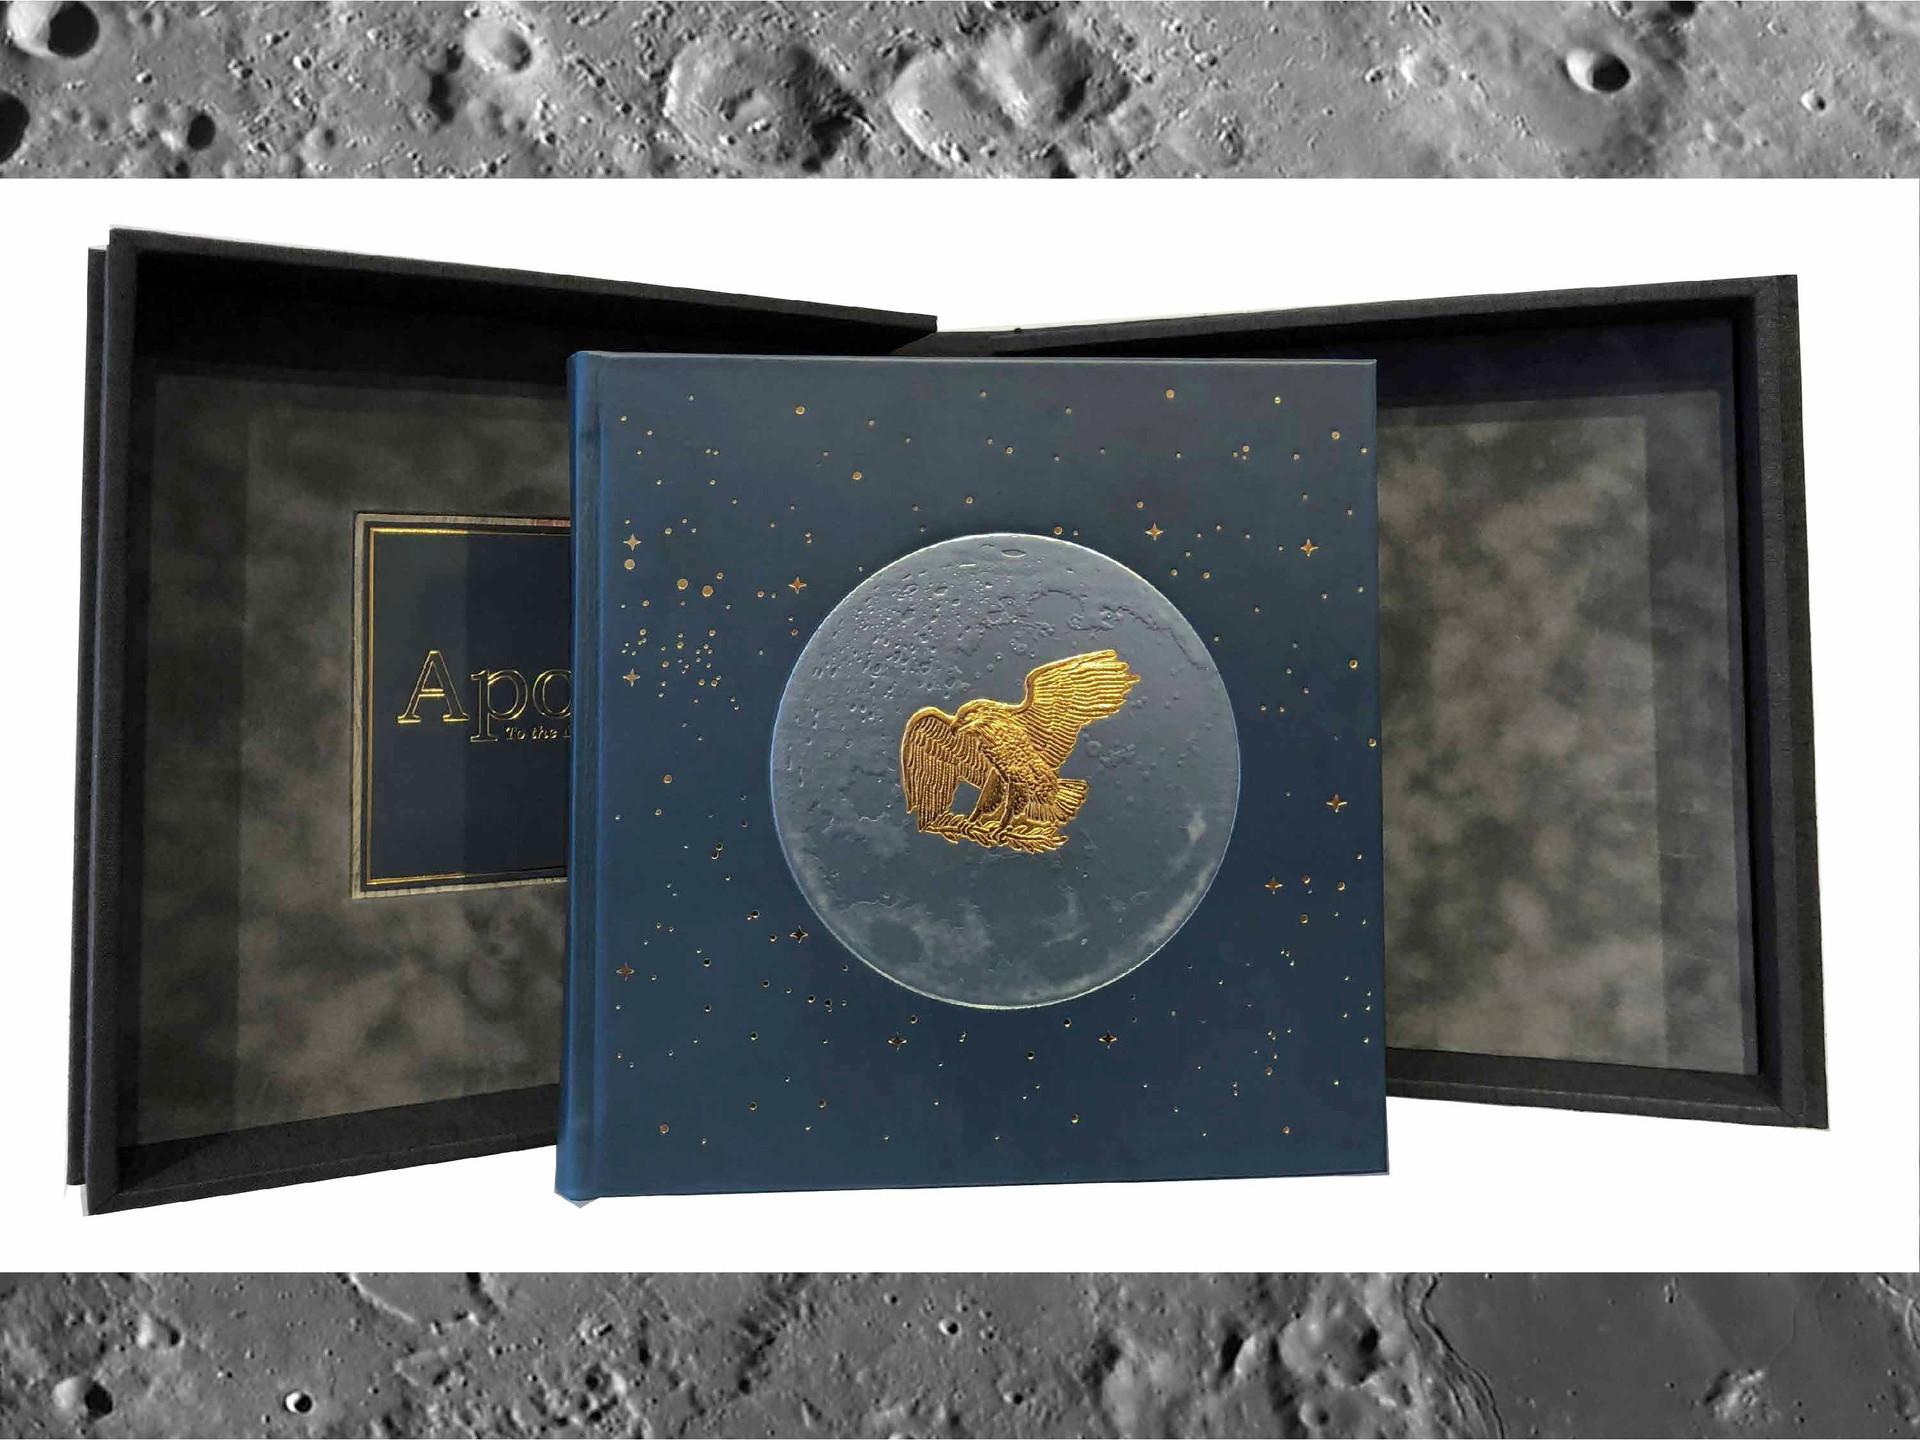 Apollo 11 eBrochure September 2019 for B